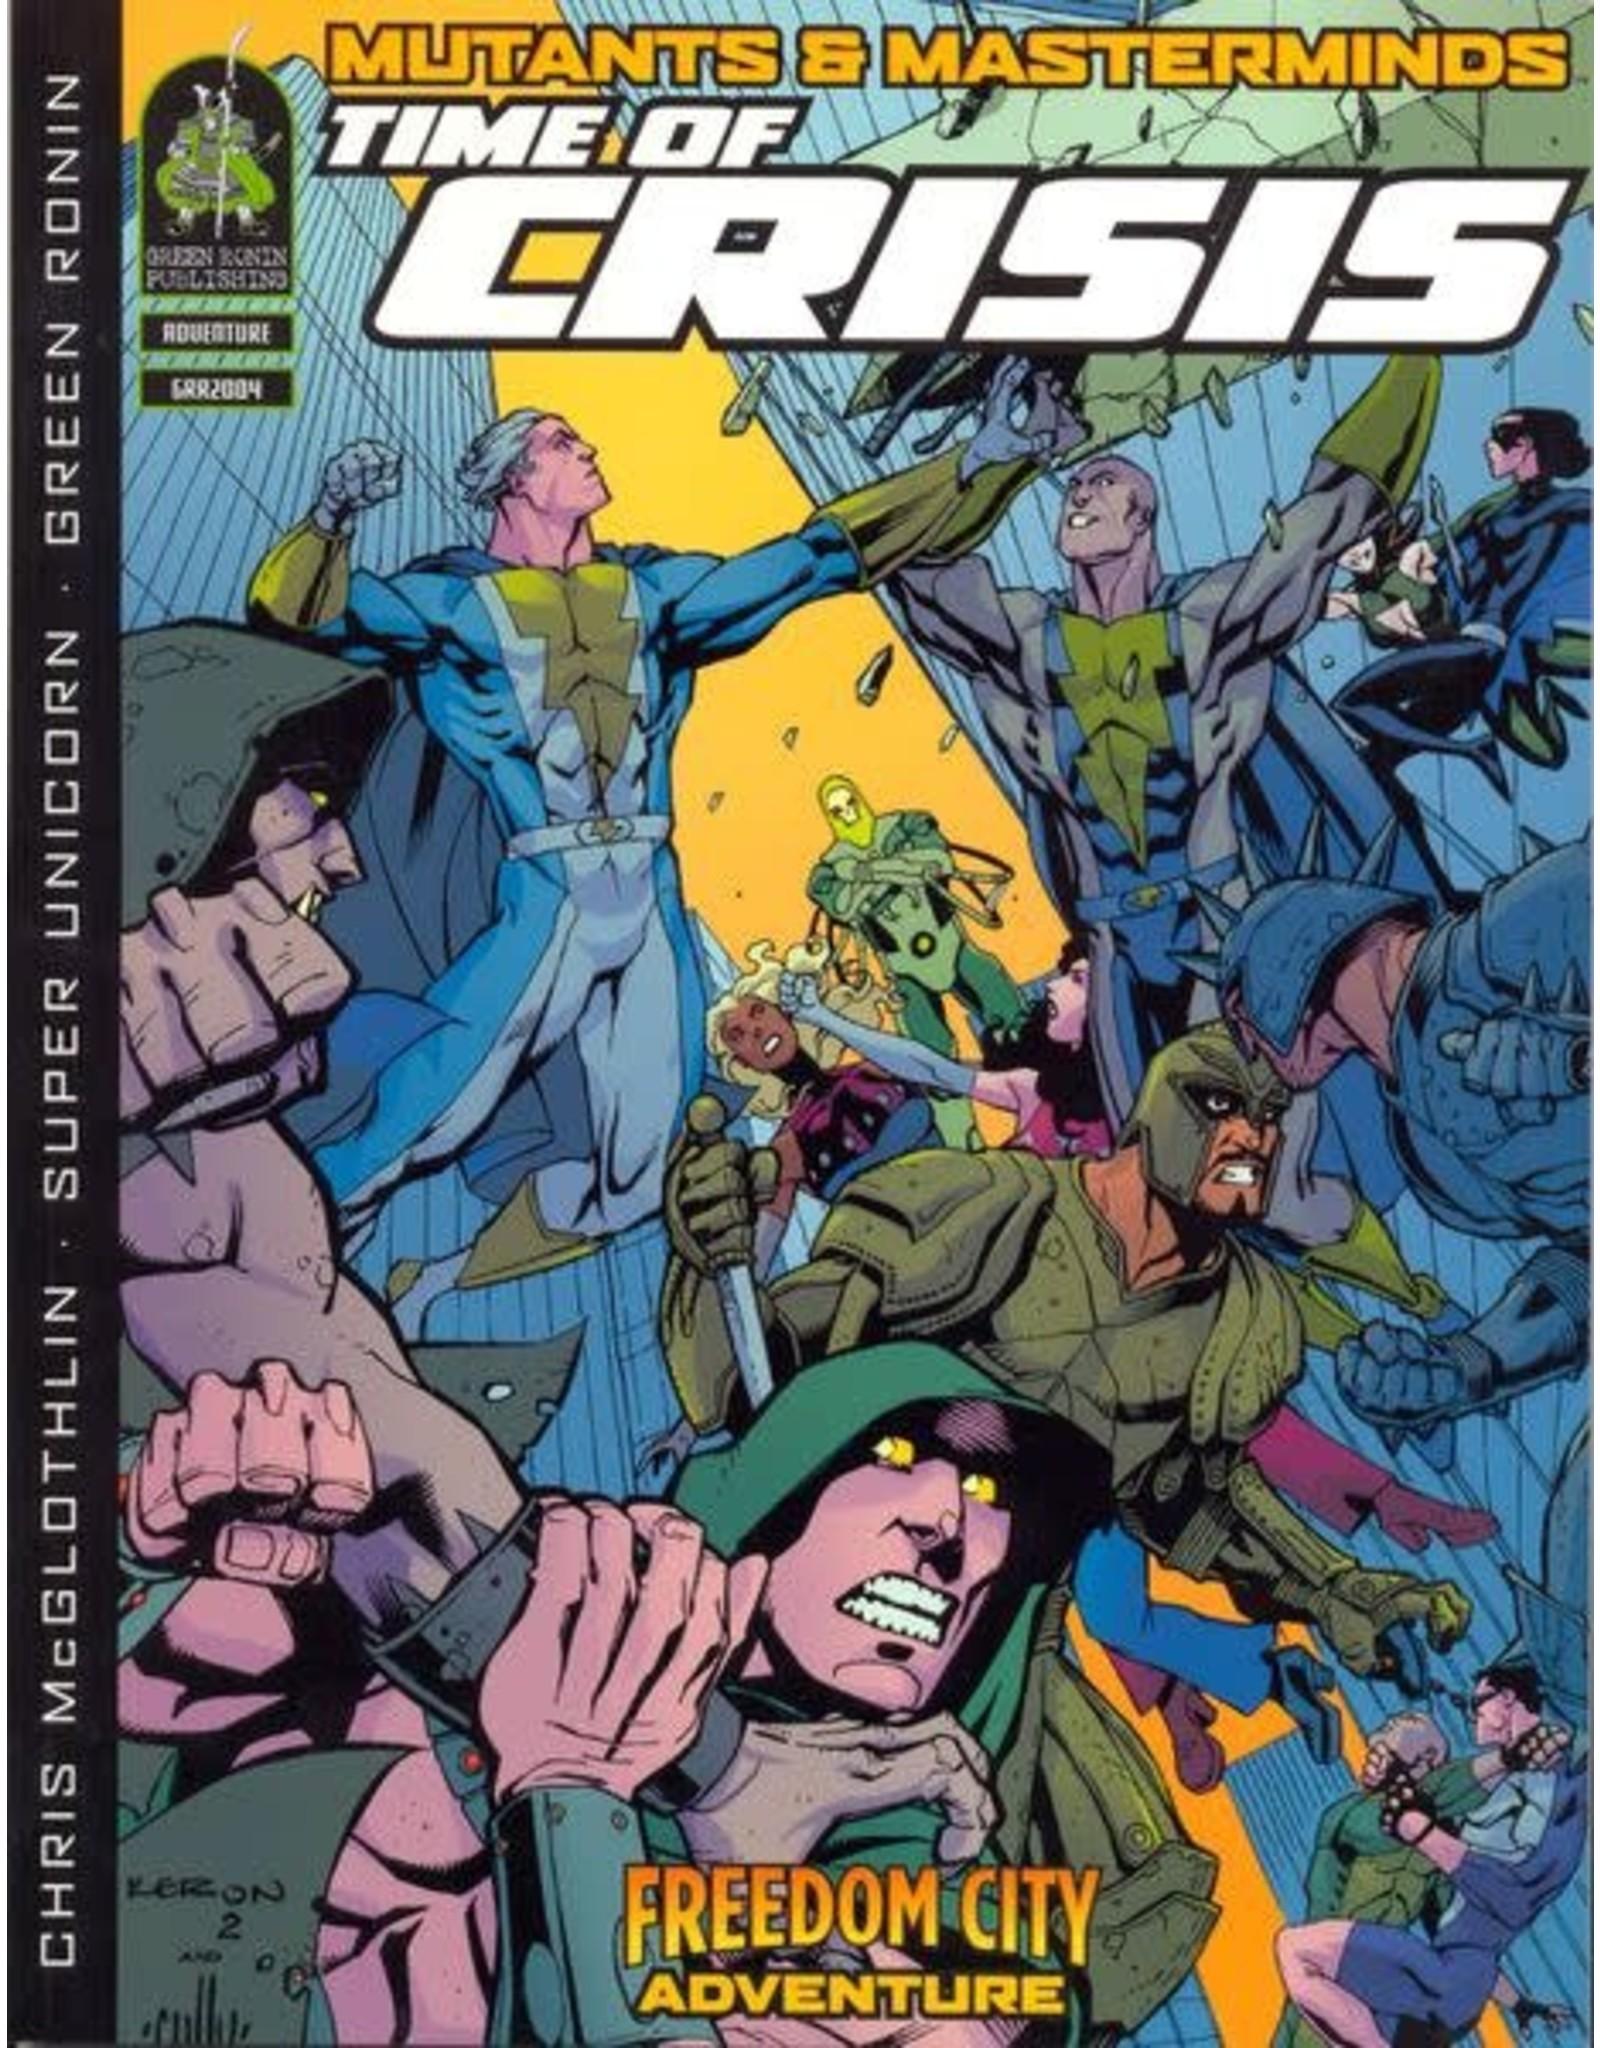 Green Ronin Publishing SALE - Mutants & Masterminds 1E: Time of Crisis